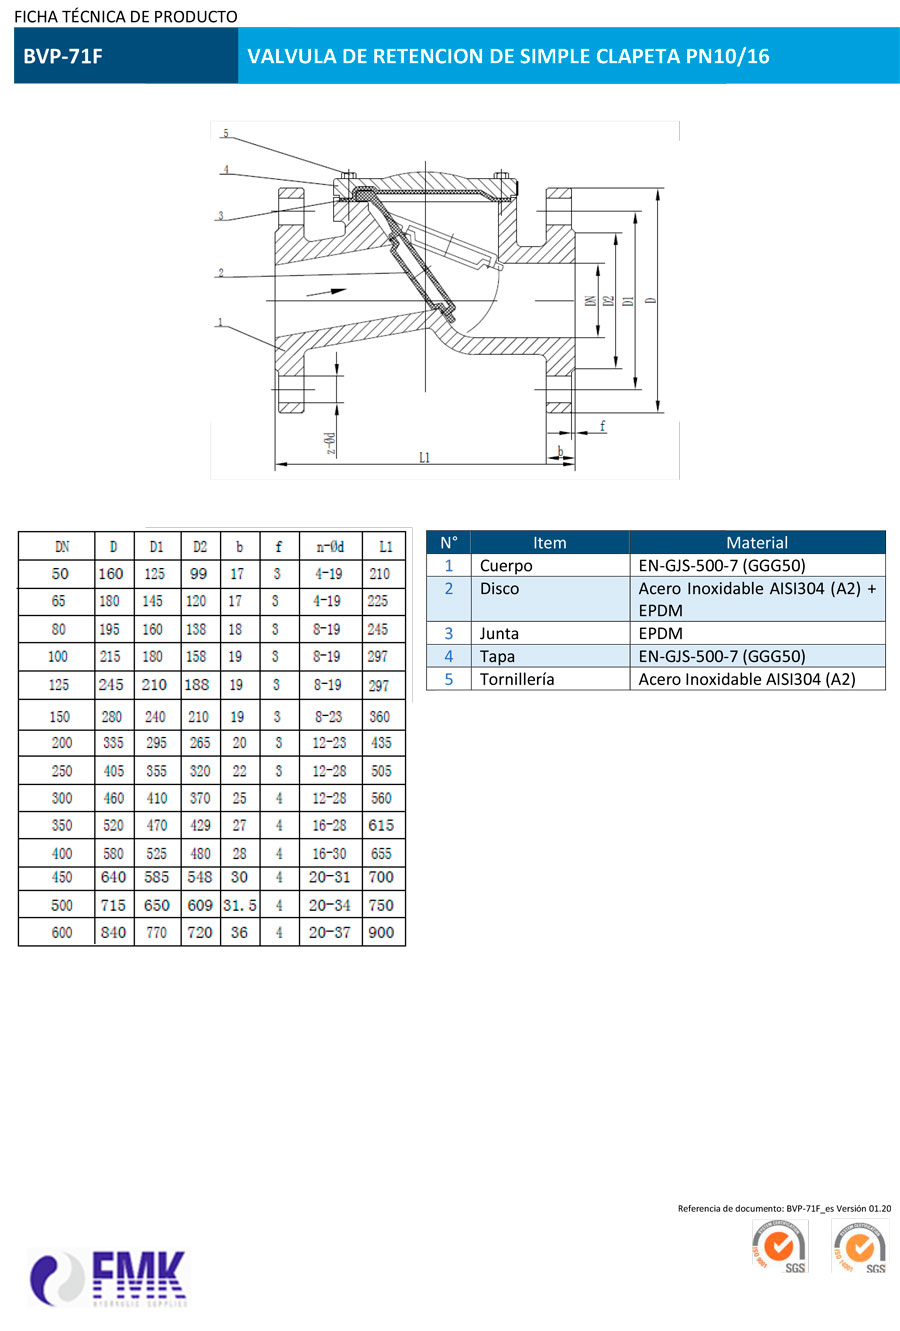 fmk-hydraulic-valvula-de-retencion-de-simple-clapeta-corta-BVP-71F-ficha-tecnica-2